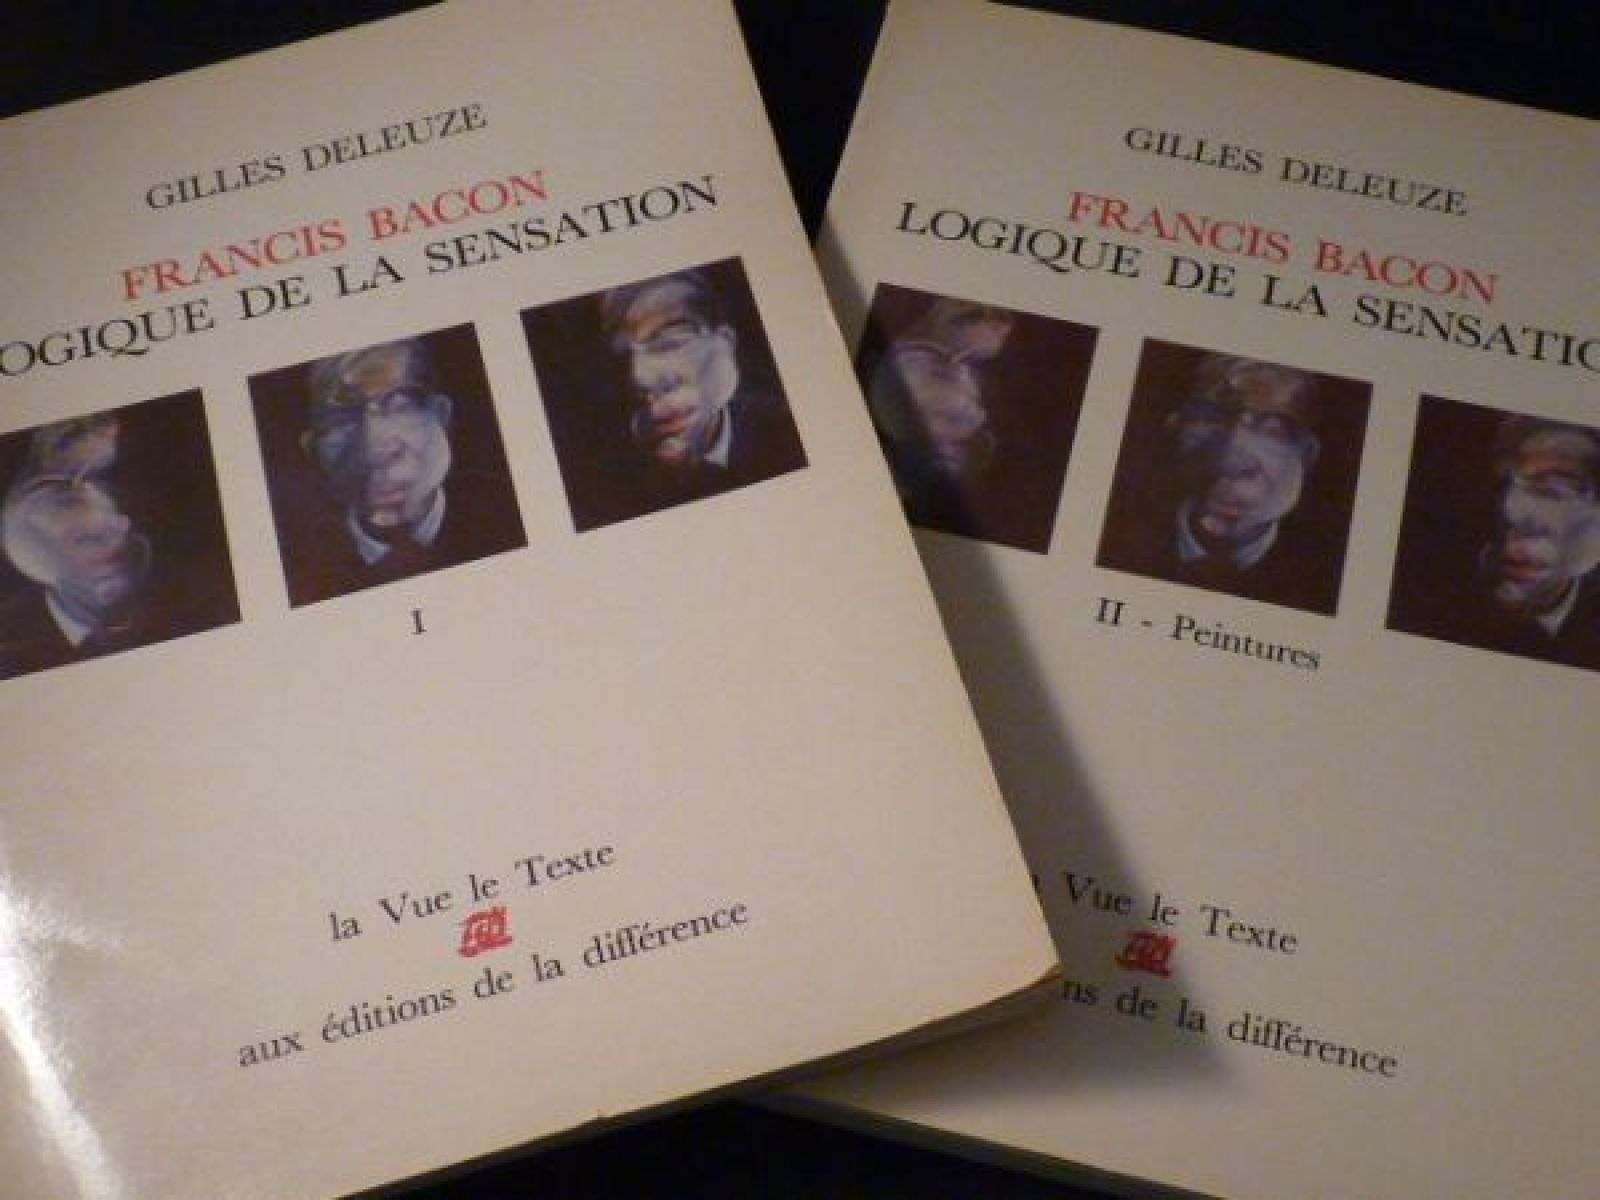 videos erotiques La Roche-sur-Yon